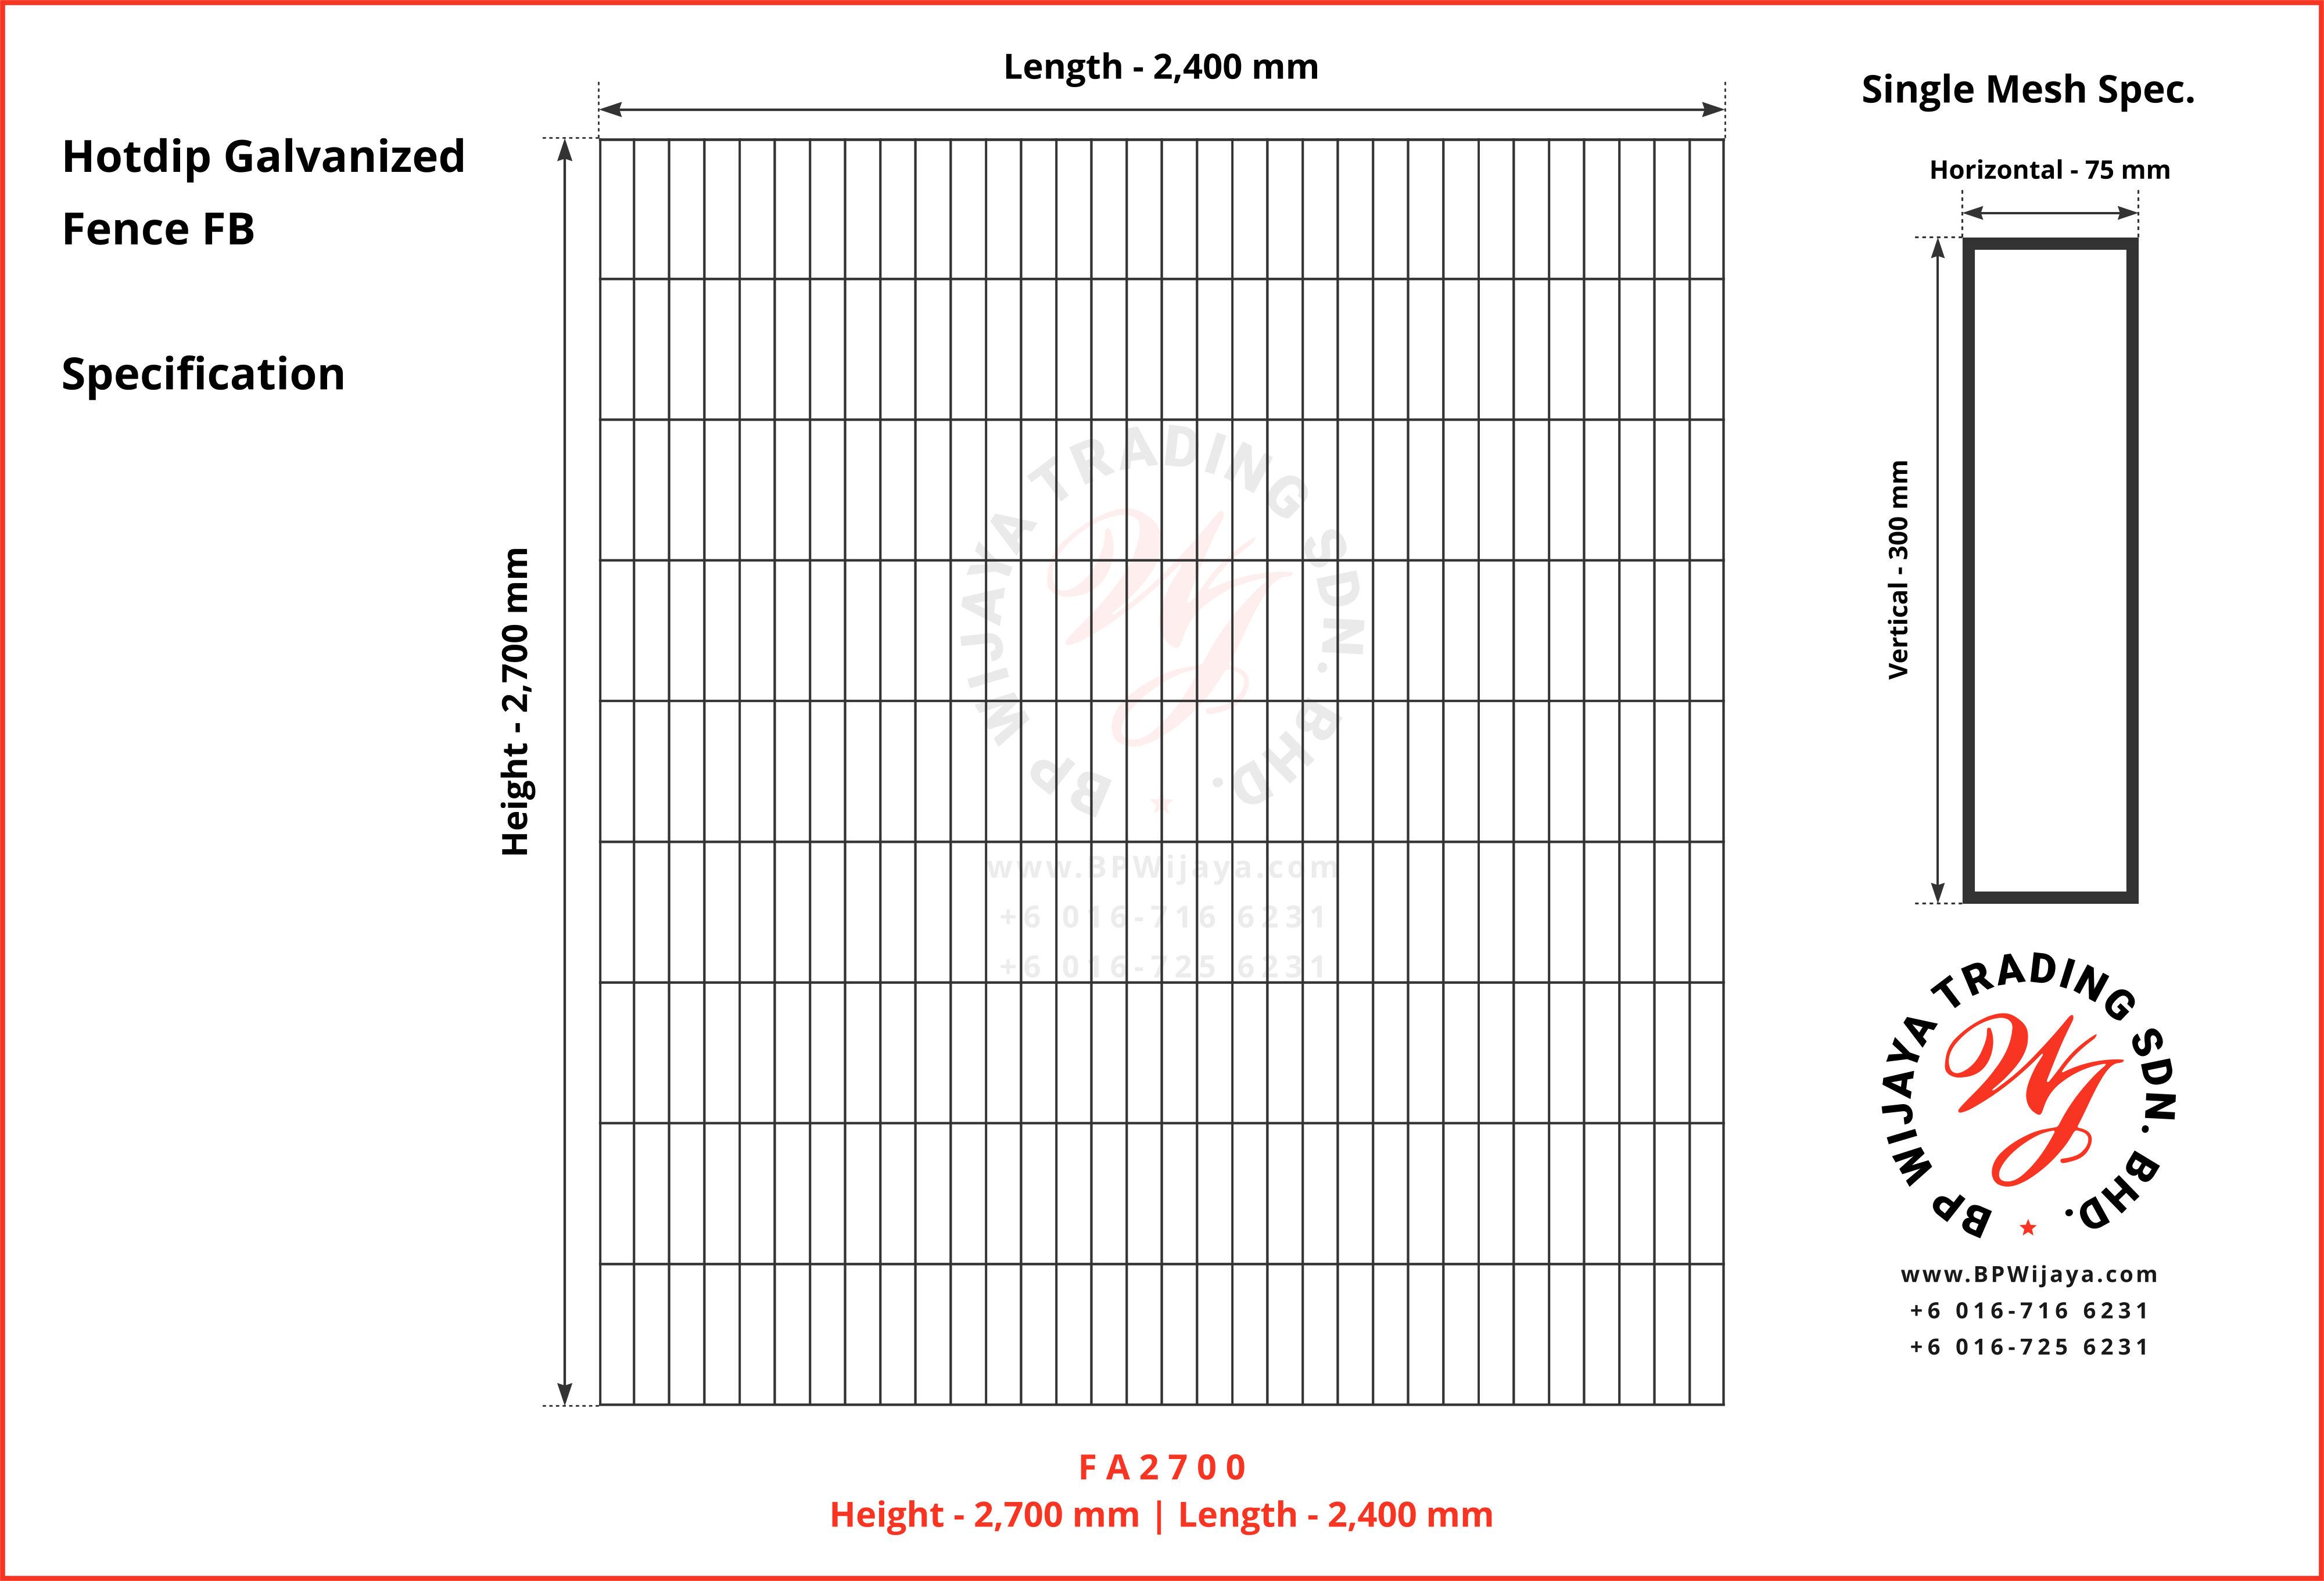 BP Wijaya Trading Sdn Bhd Malaysia Johor Batu Pahat manufacturer of safety fences building materials Hotdip Galvanized Fence Mesh Wire Fence FB BRC A08